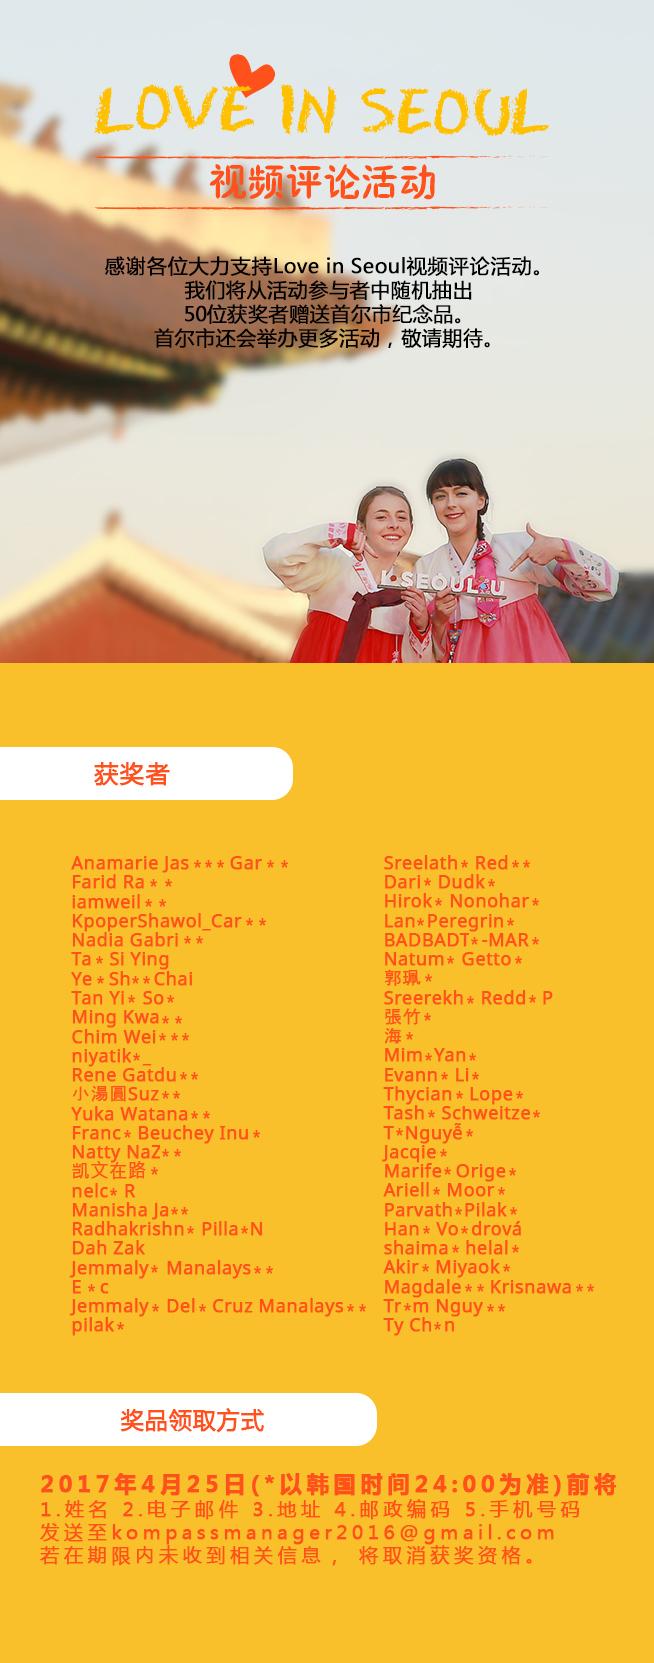 Love in Seoul视频评论活动 感谢各位大力支持Love in Seoul视频评论活动。 我们将从活动参与者中随机抽出 50位获奖者赠送首尔市纪念品。 首尔市还会举办更多活动,敬请期待。